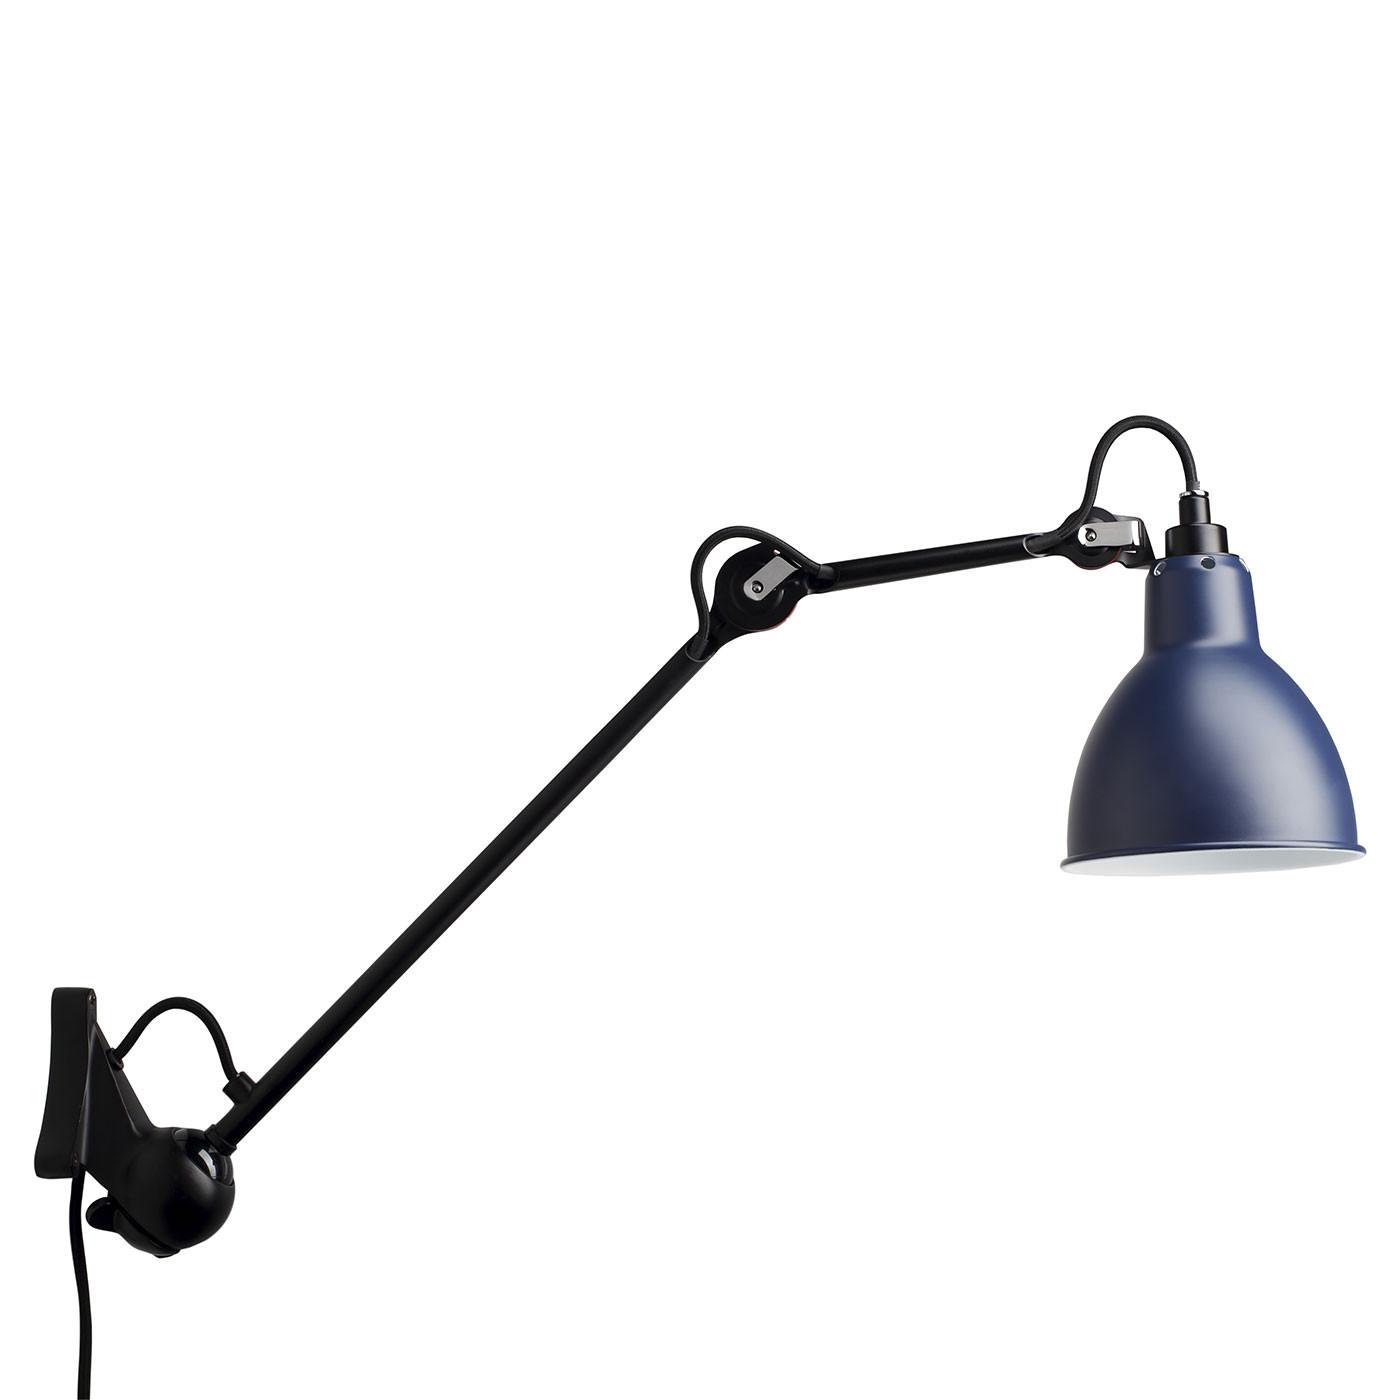 DCW Lampe Gras No 222, schwarz